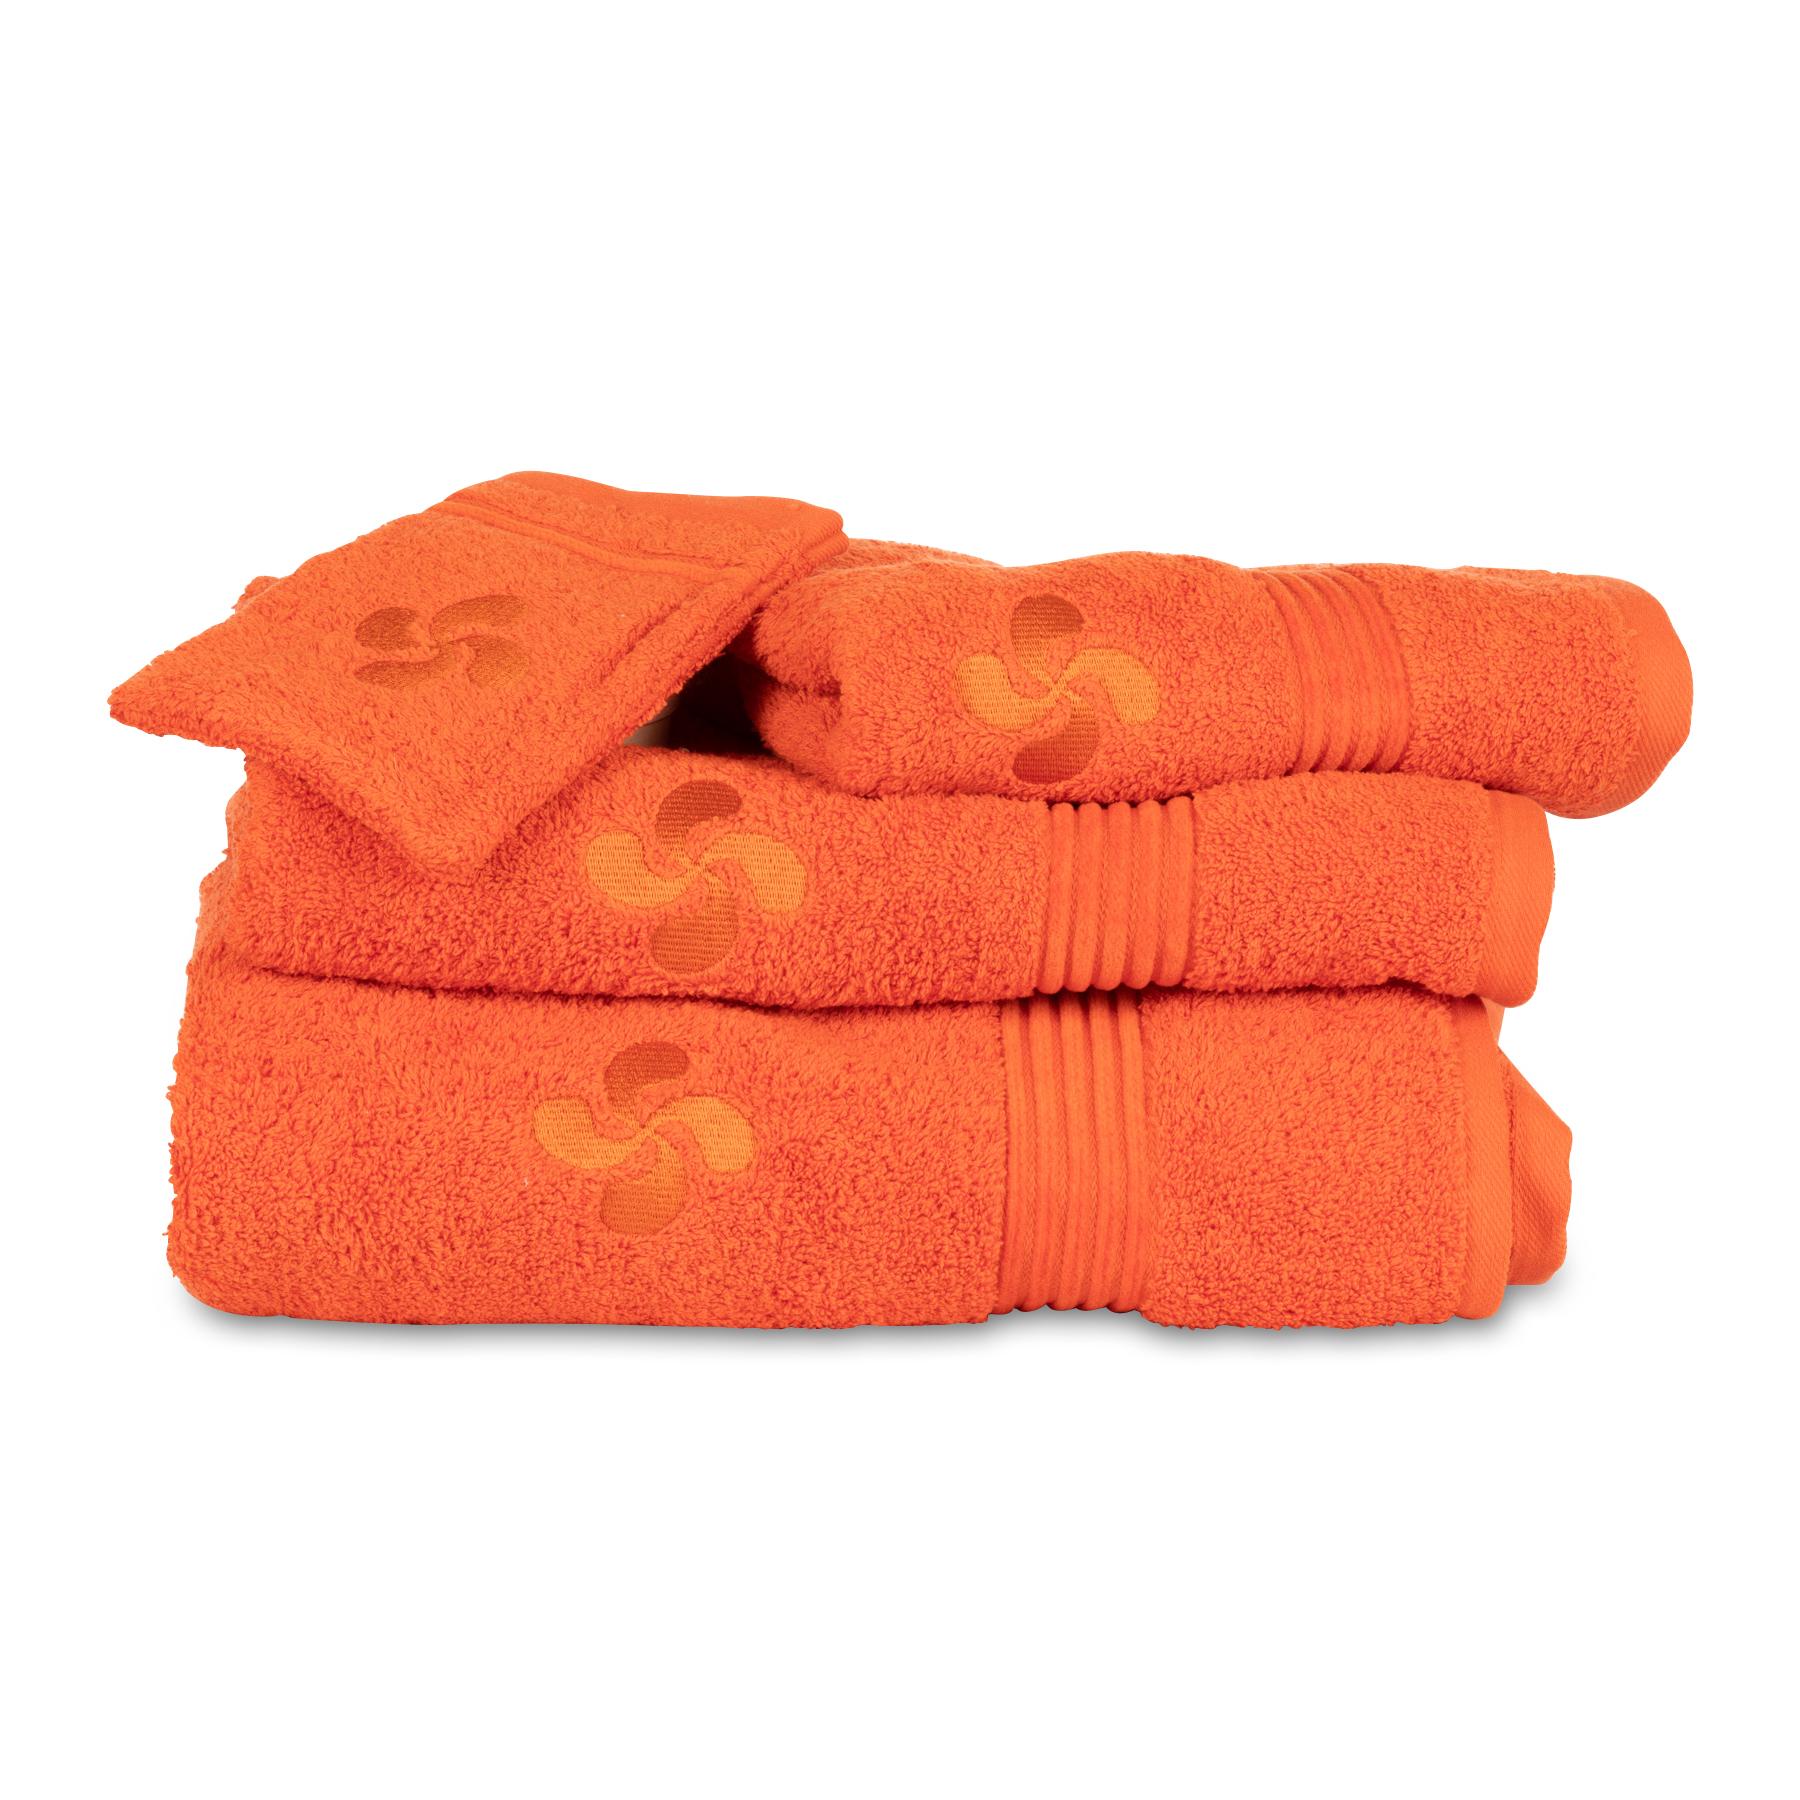 Luka orange